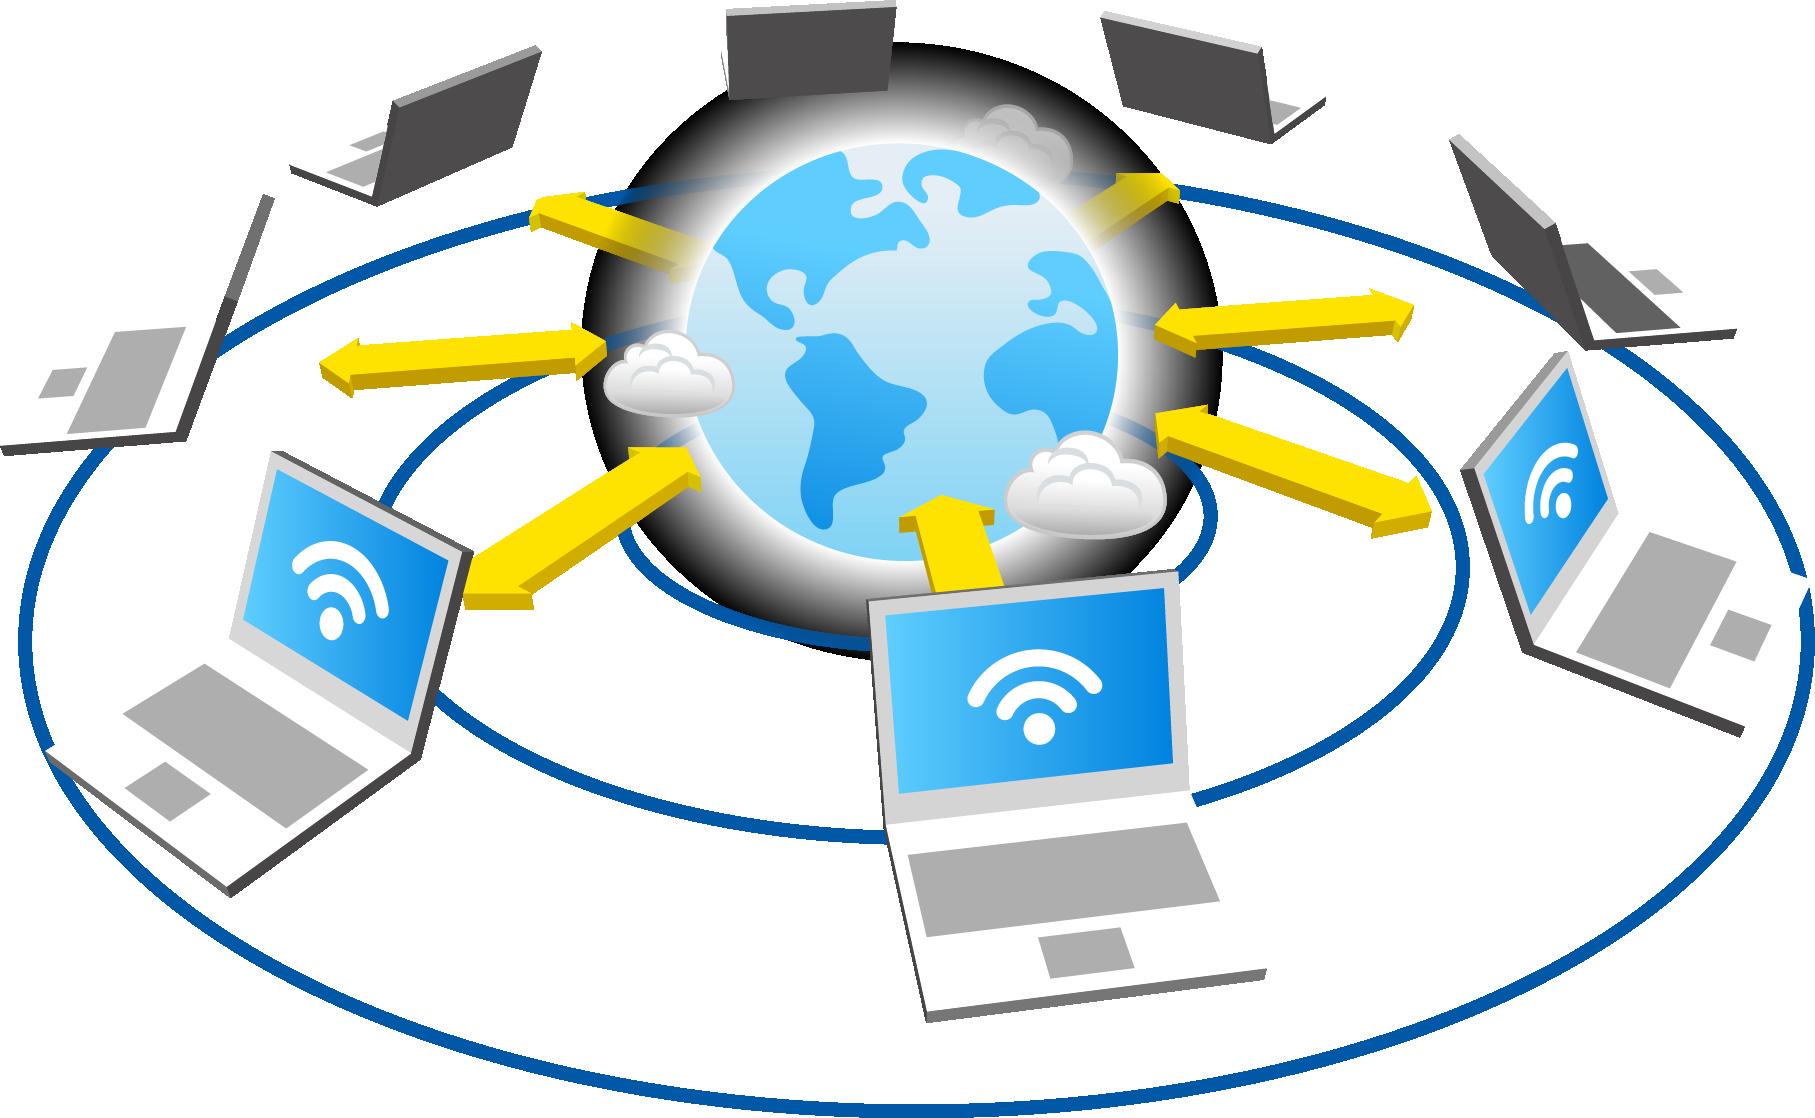 clip art freeuse Vector computer networking. Network download adobe illustrator